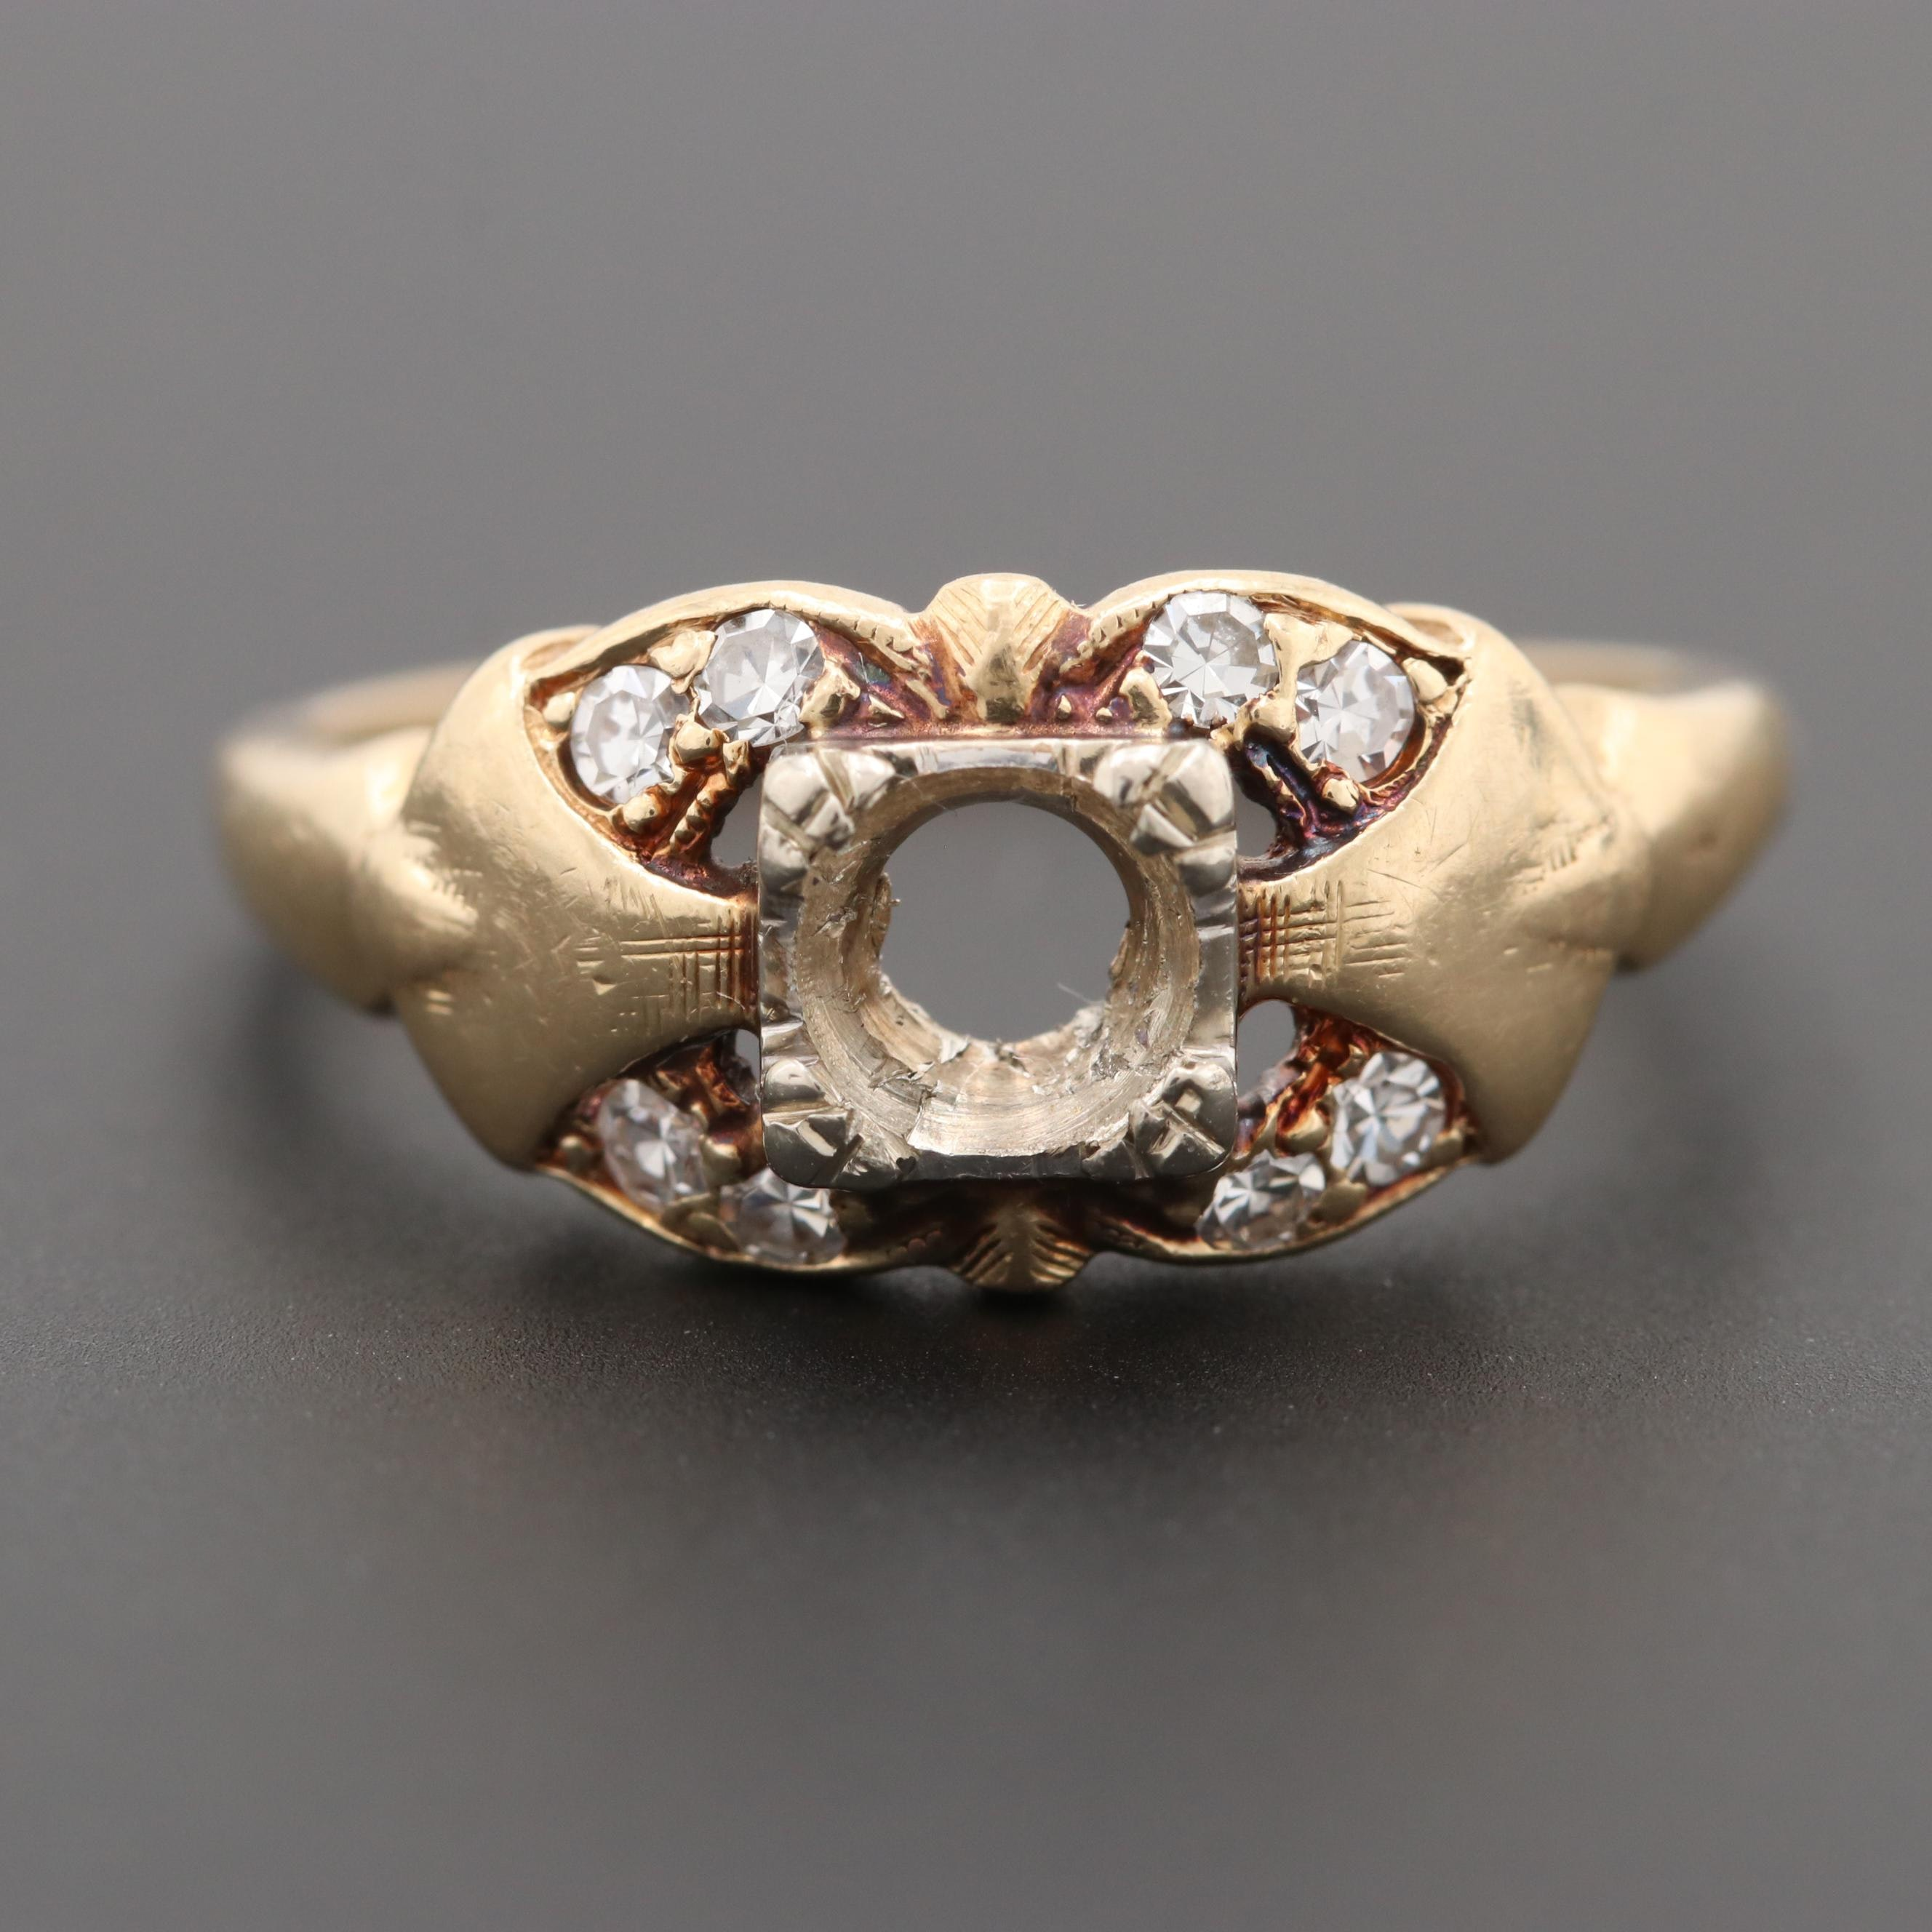 Vintage 14K Yellow Gold Diamond Semi Mount Ring